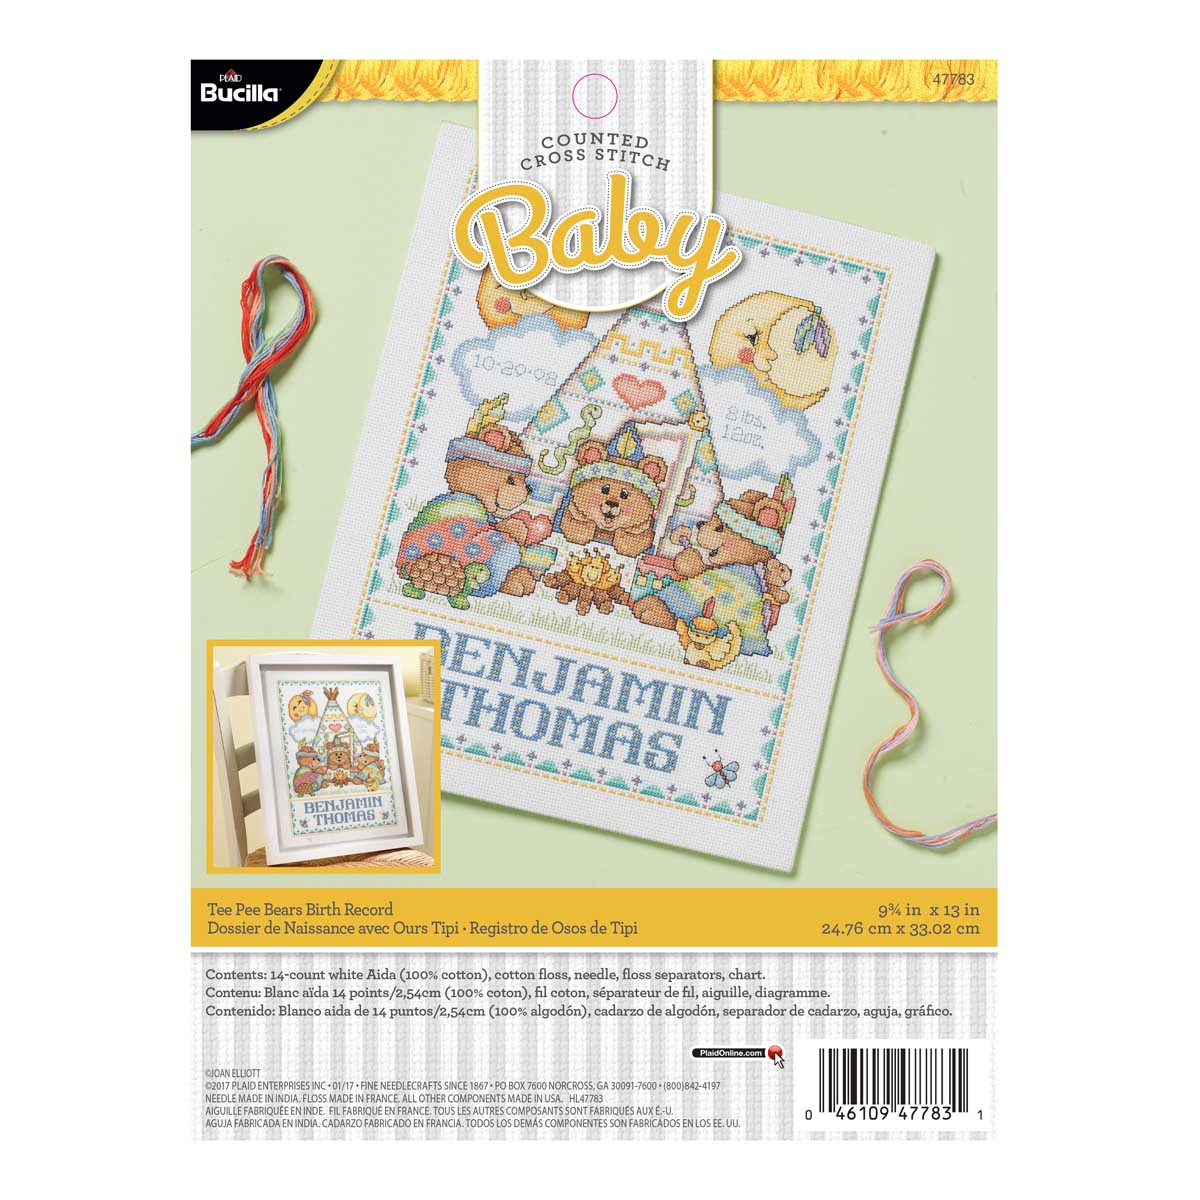 Bucilla ® Baby - Counted Cross Stitch - Crib Ensembles - Tee Pee Bears - Birth Record Kit